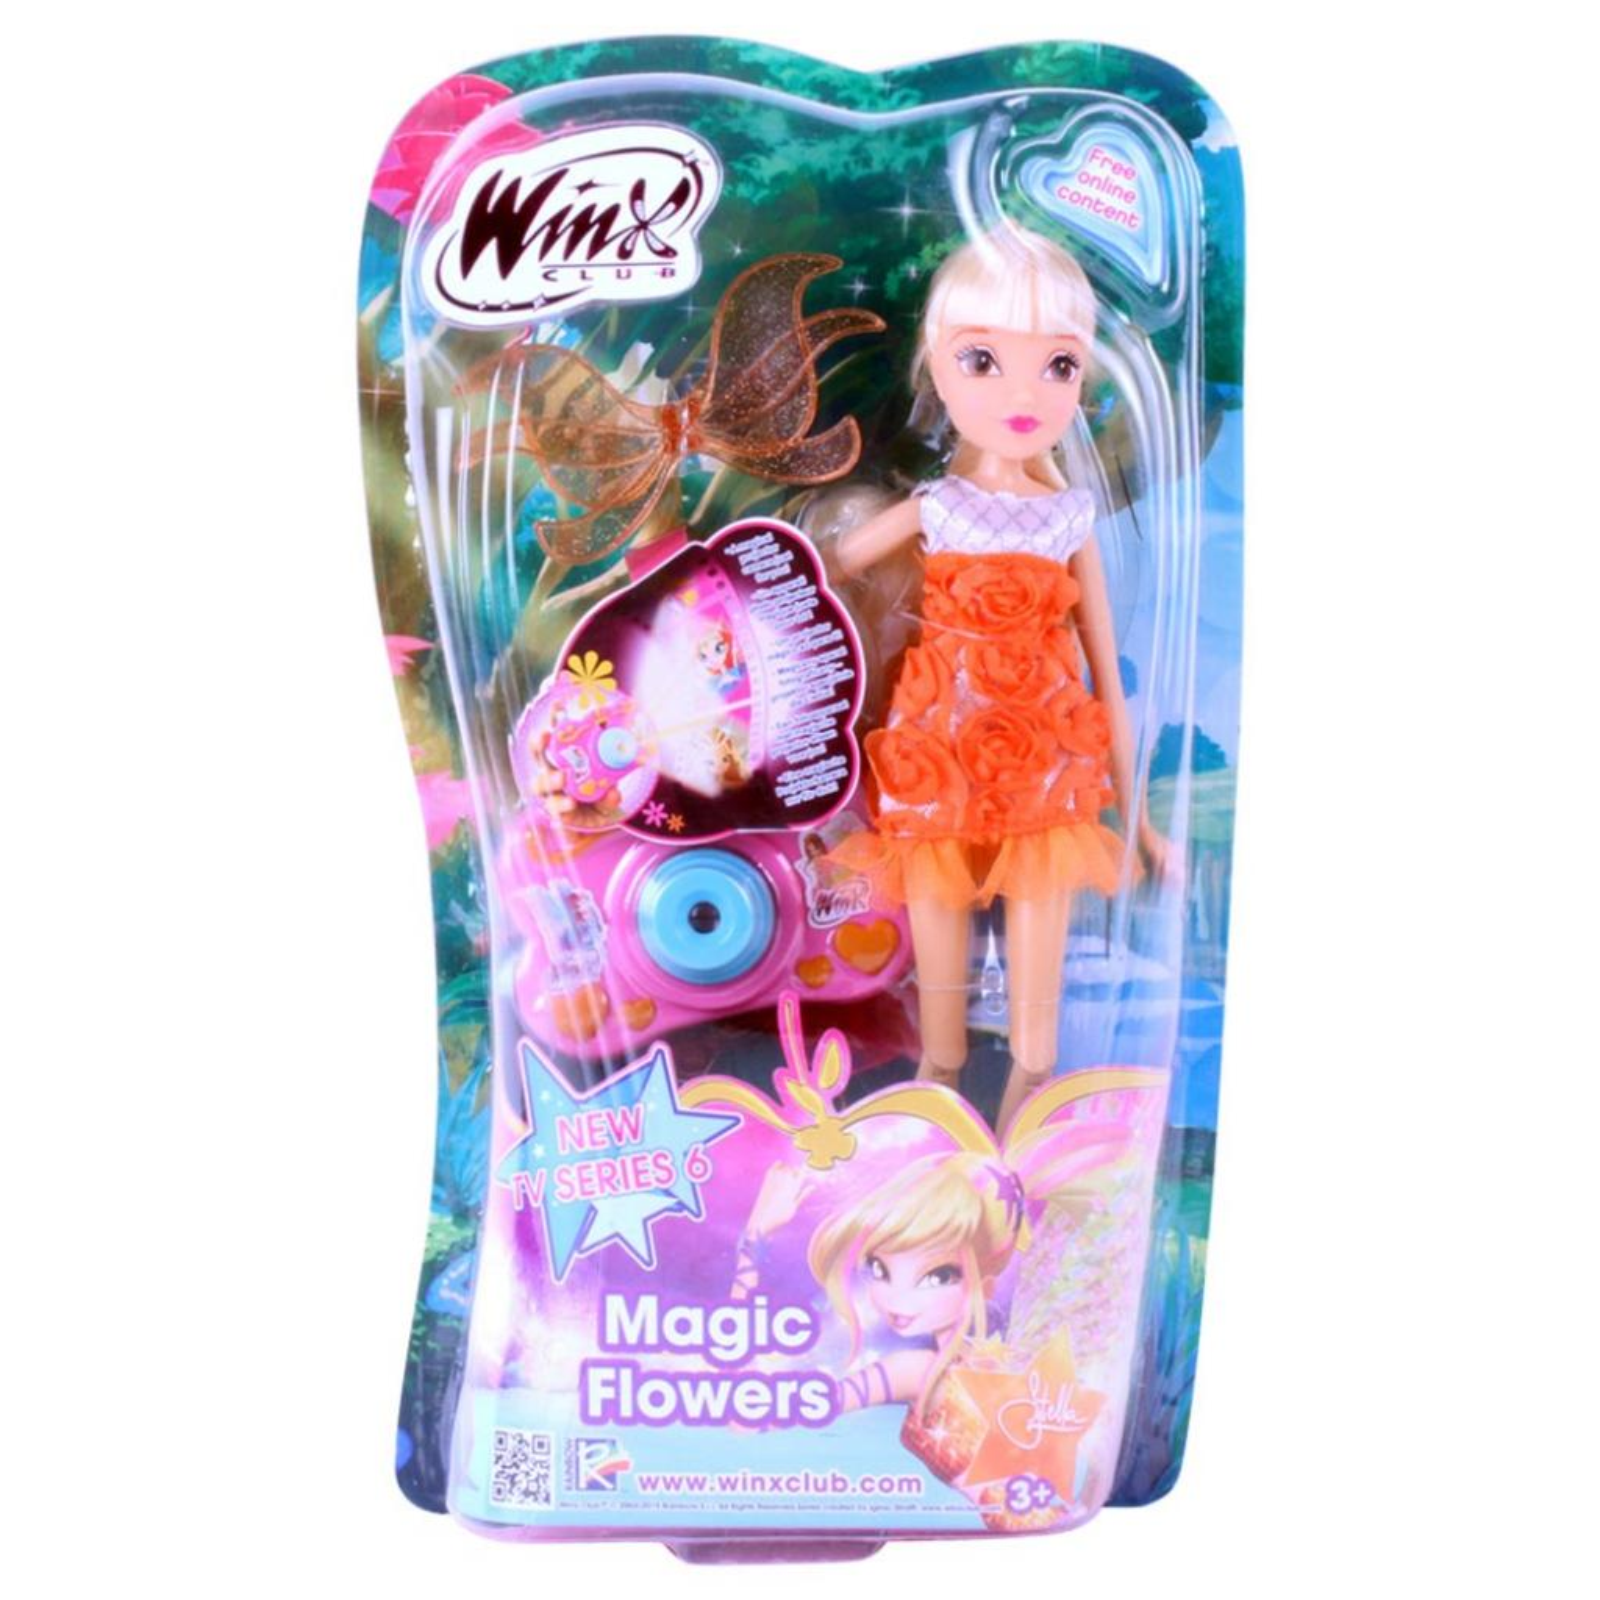 Кукла WinX Волшебные цветы Стелла 27 см (IW01021403)